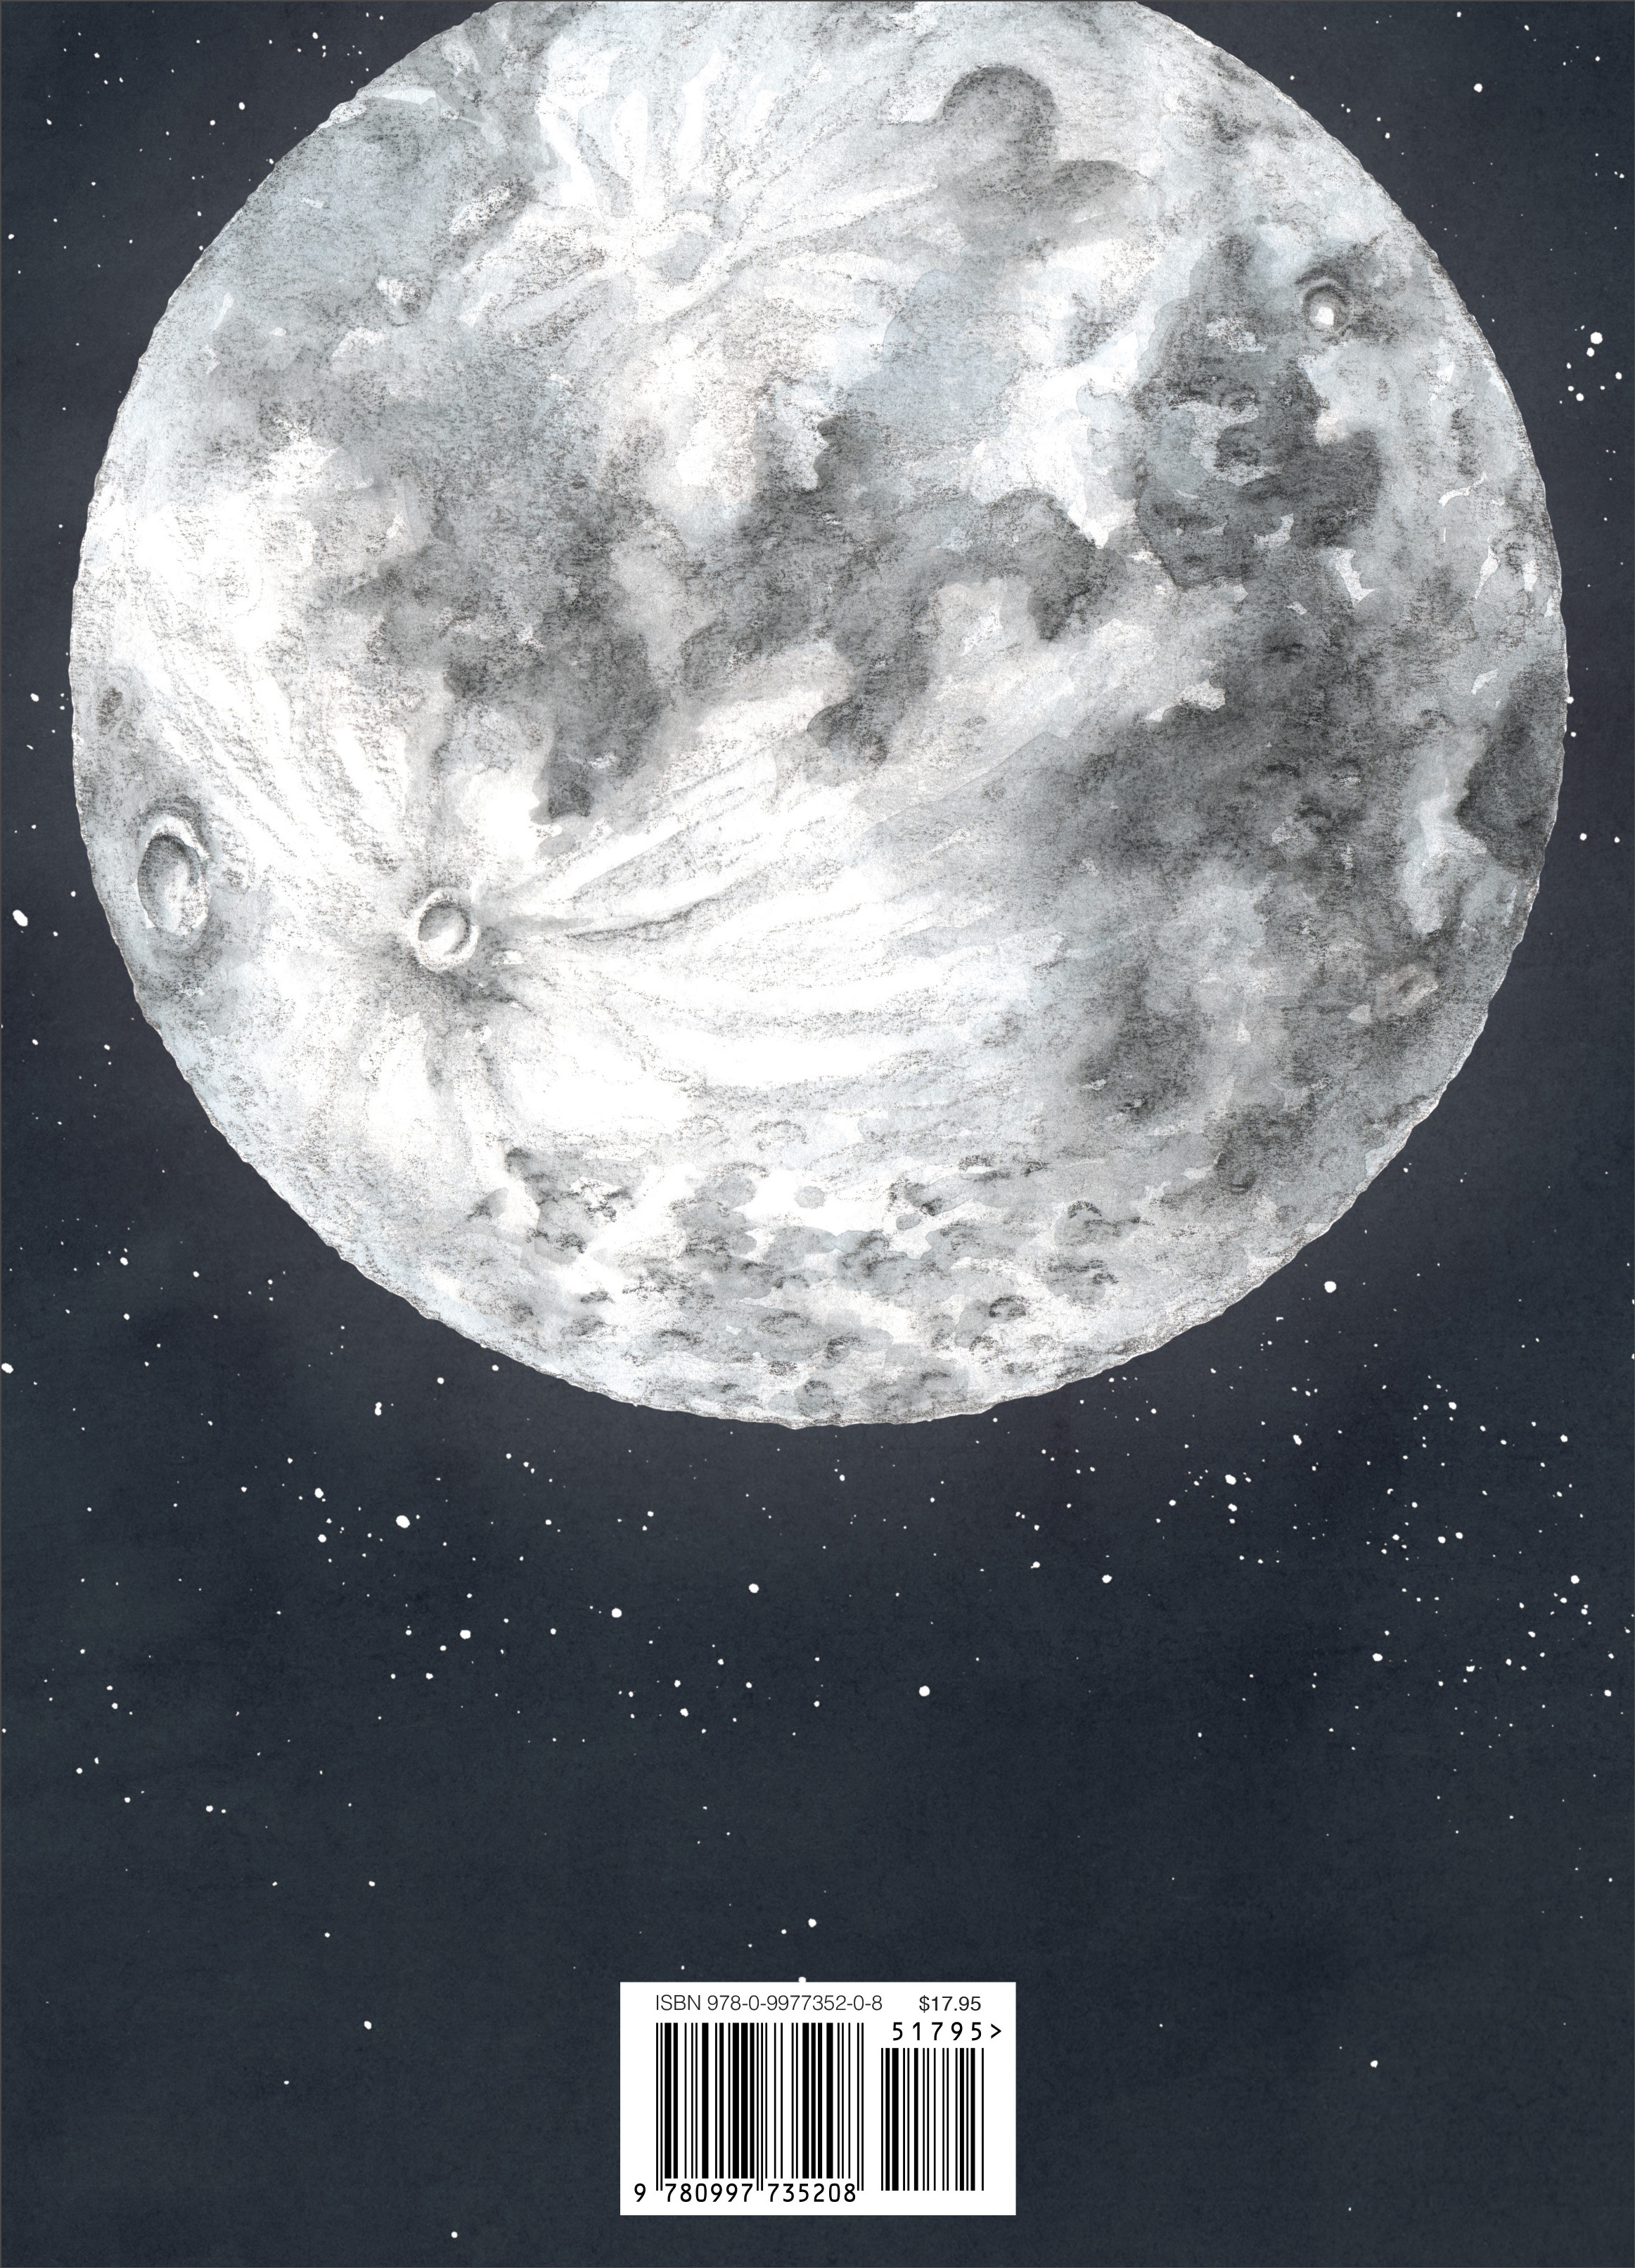 Little Moon Rear Cover_Resized.jpg